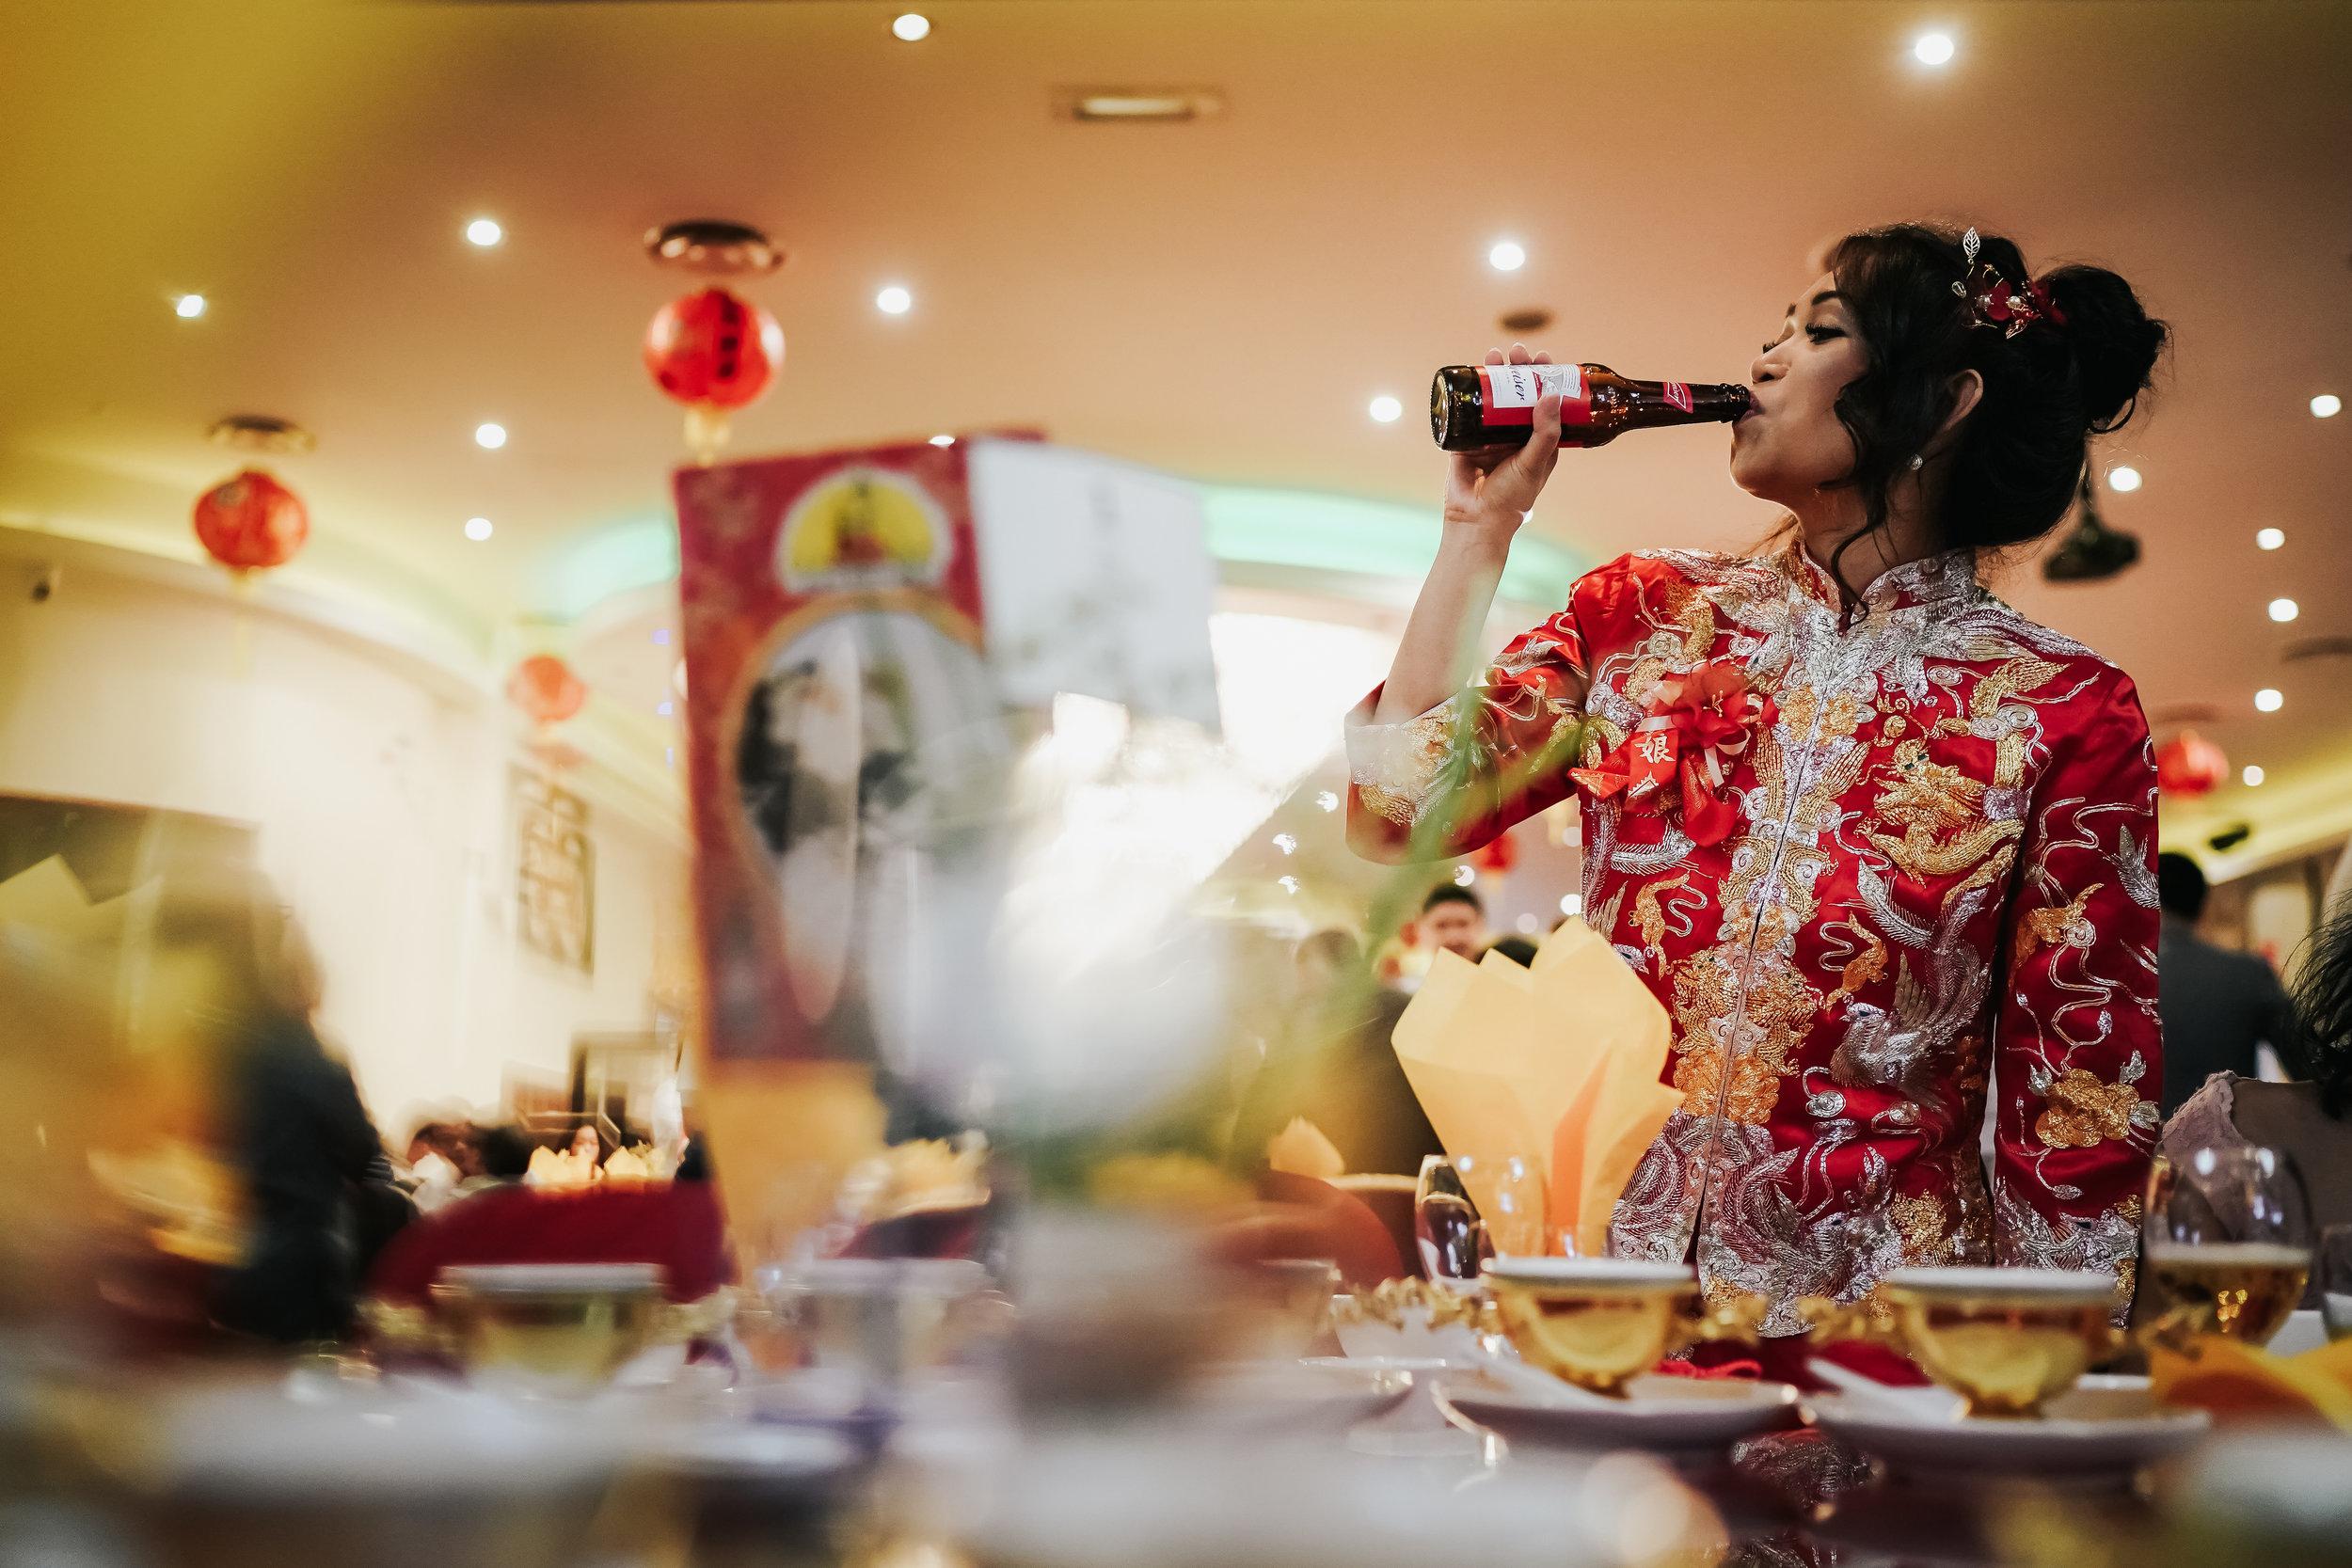 Chinese Wedding Photography Manchester wedding photographer Cheshire - 036.jpg